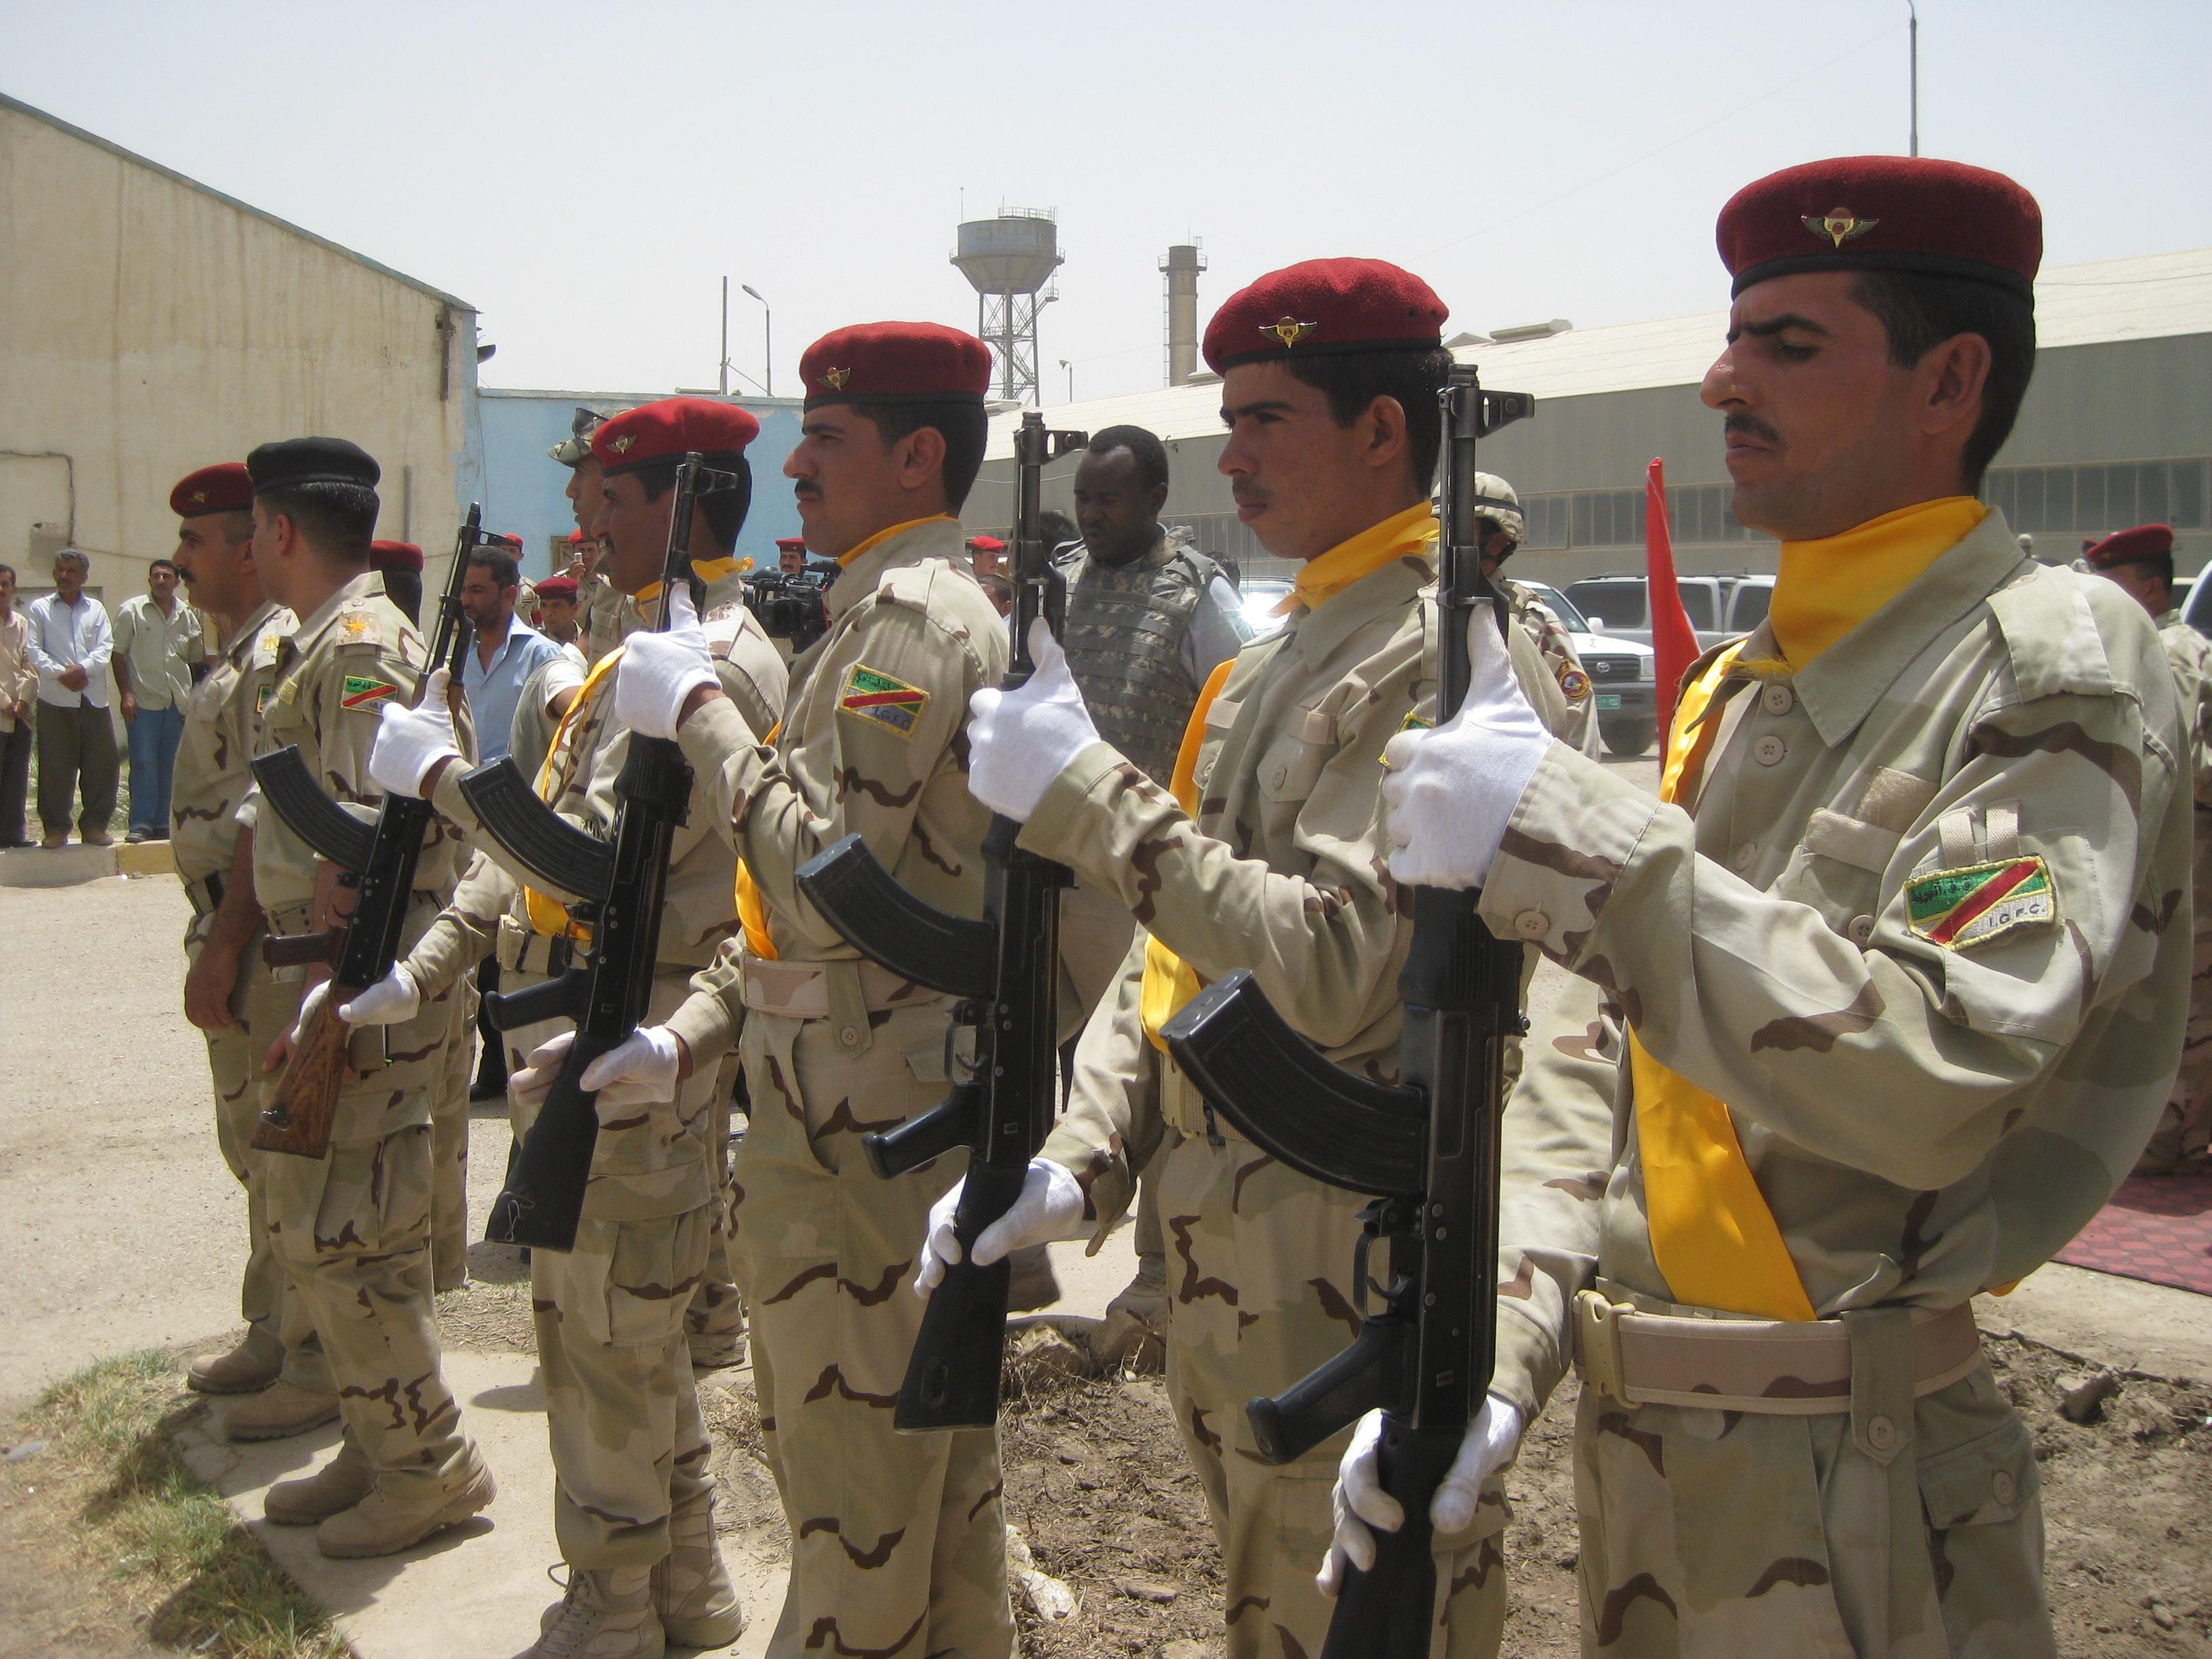 U.S.-Iraqi base transfer ceremony near Majaar Al Kabir